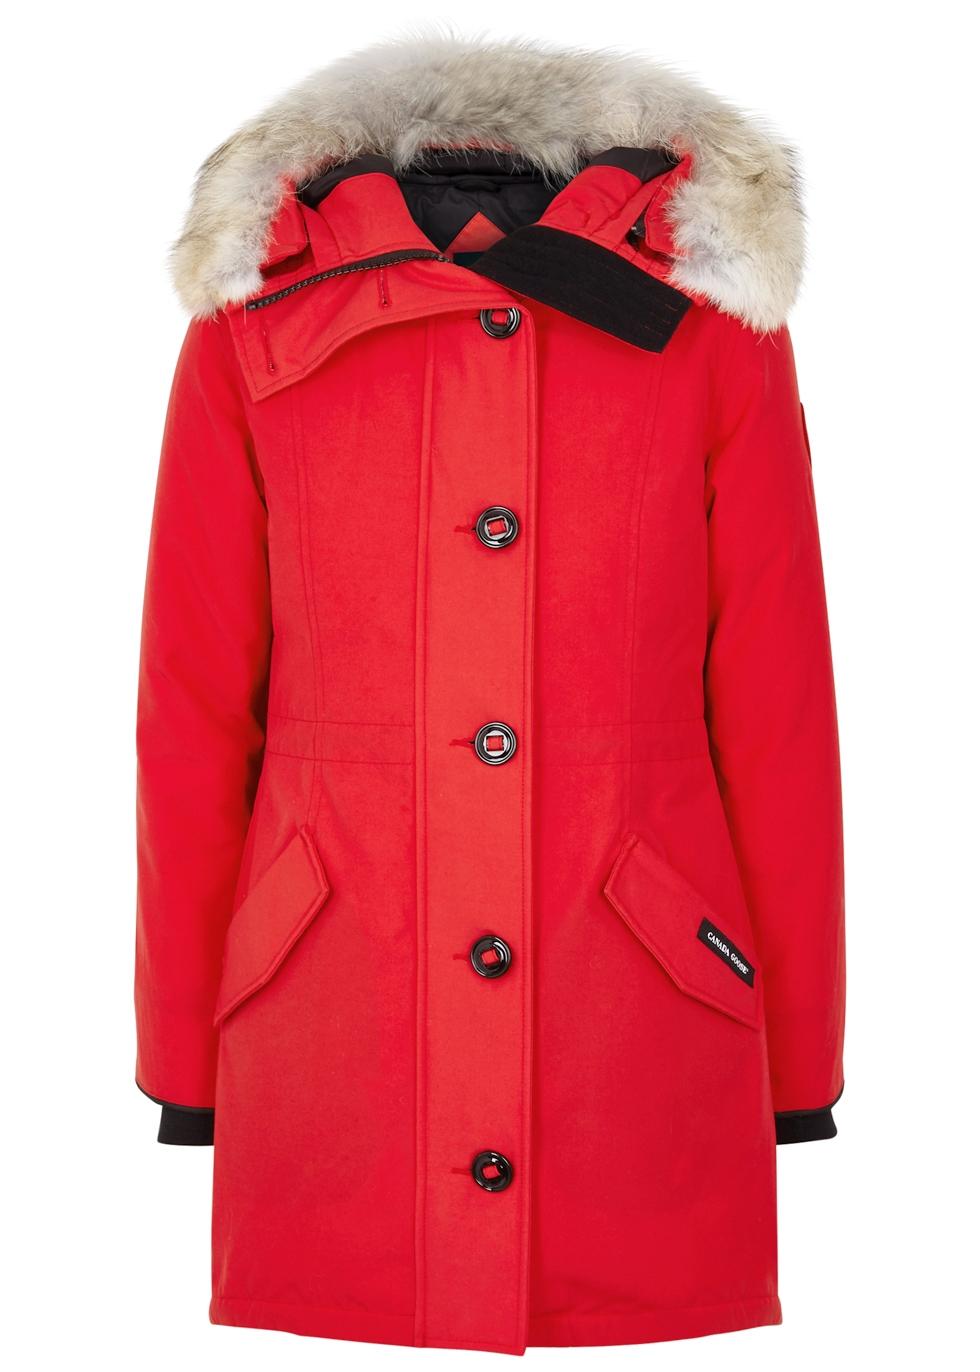 canada goose rossclair tech parka jacket w/ fur